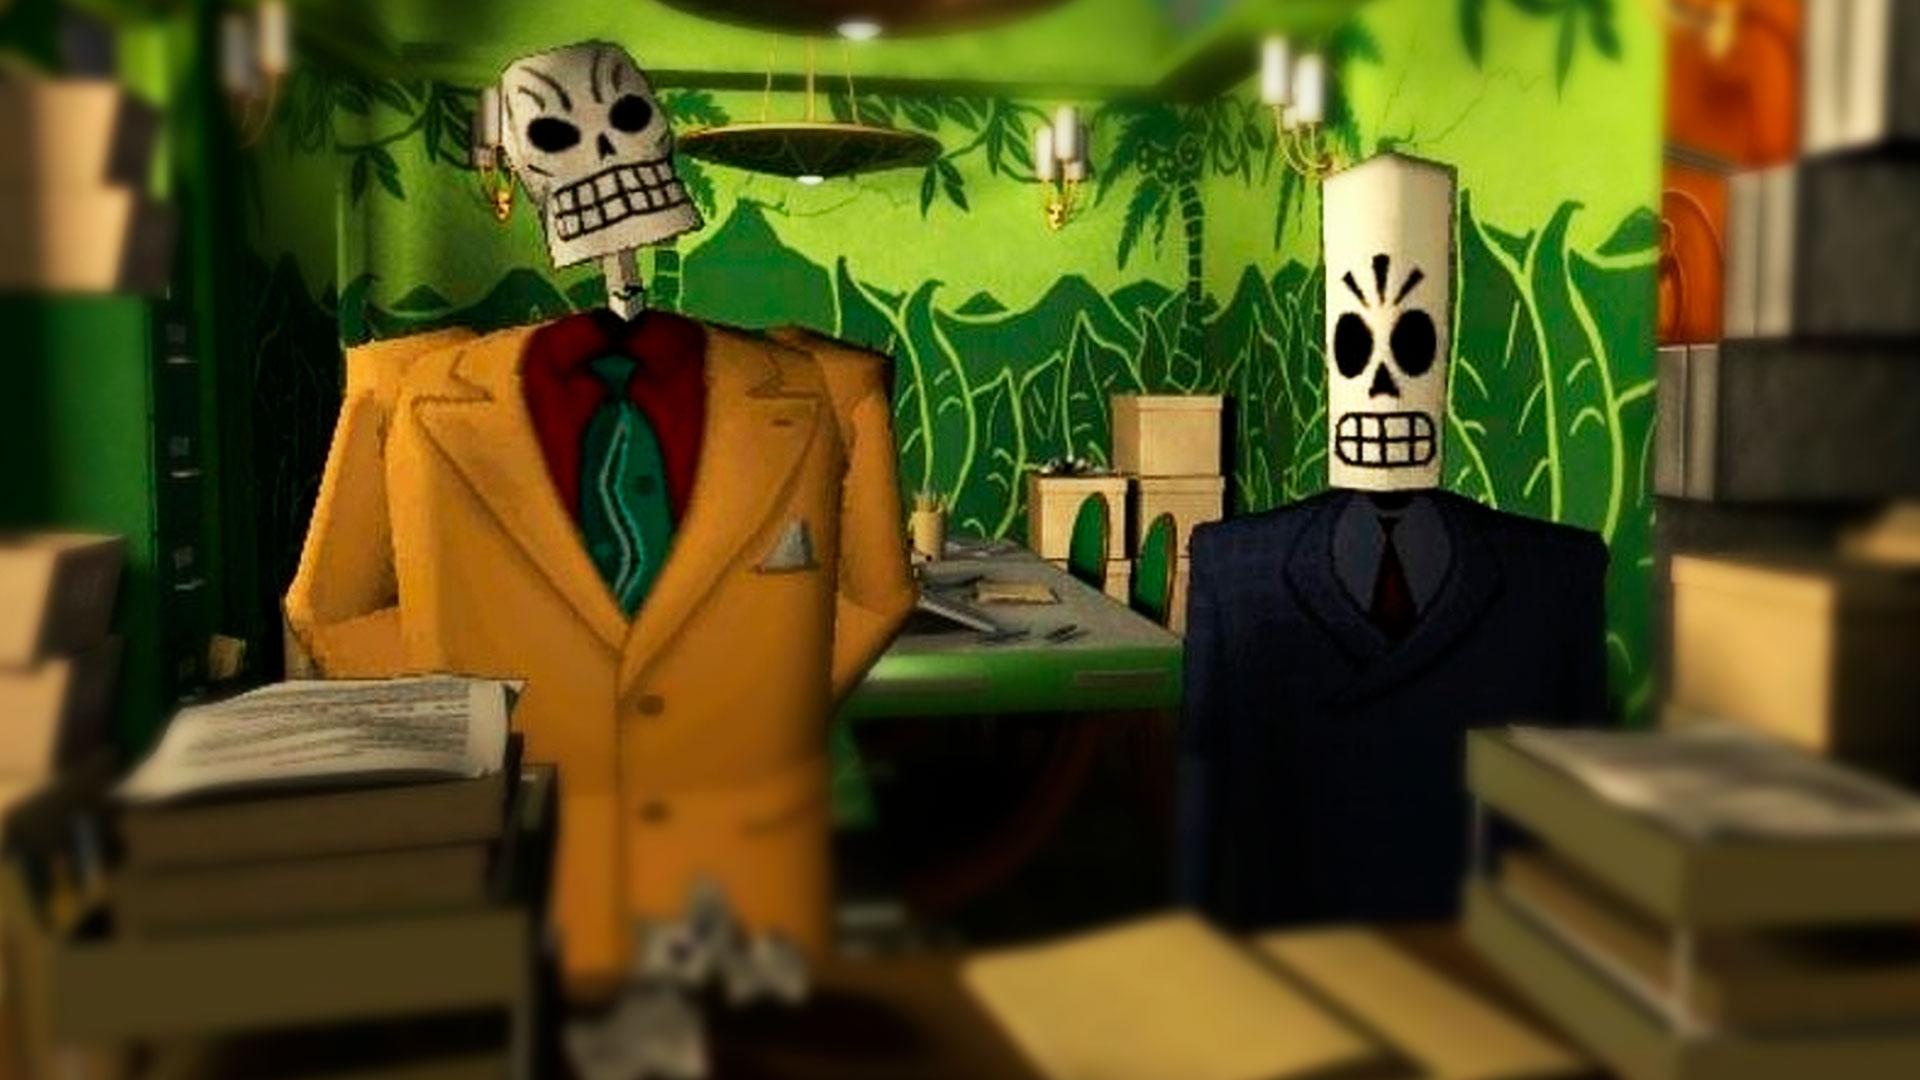 Мексиканский квест Грим Фандаго